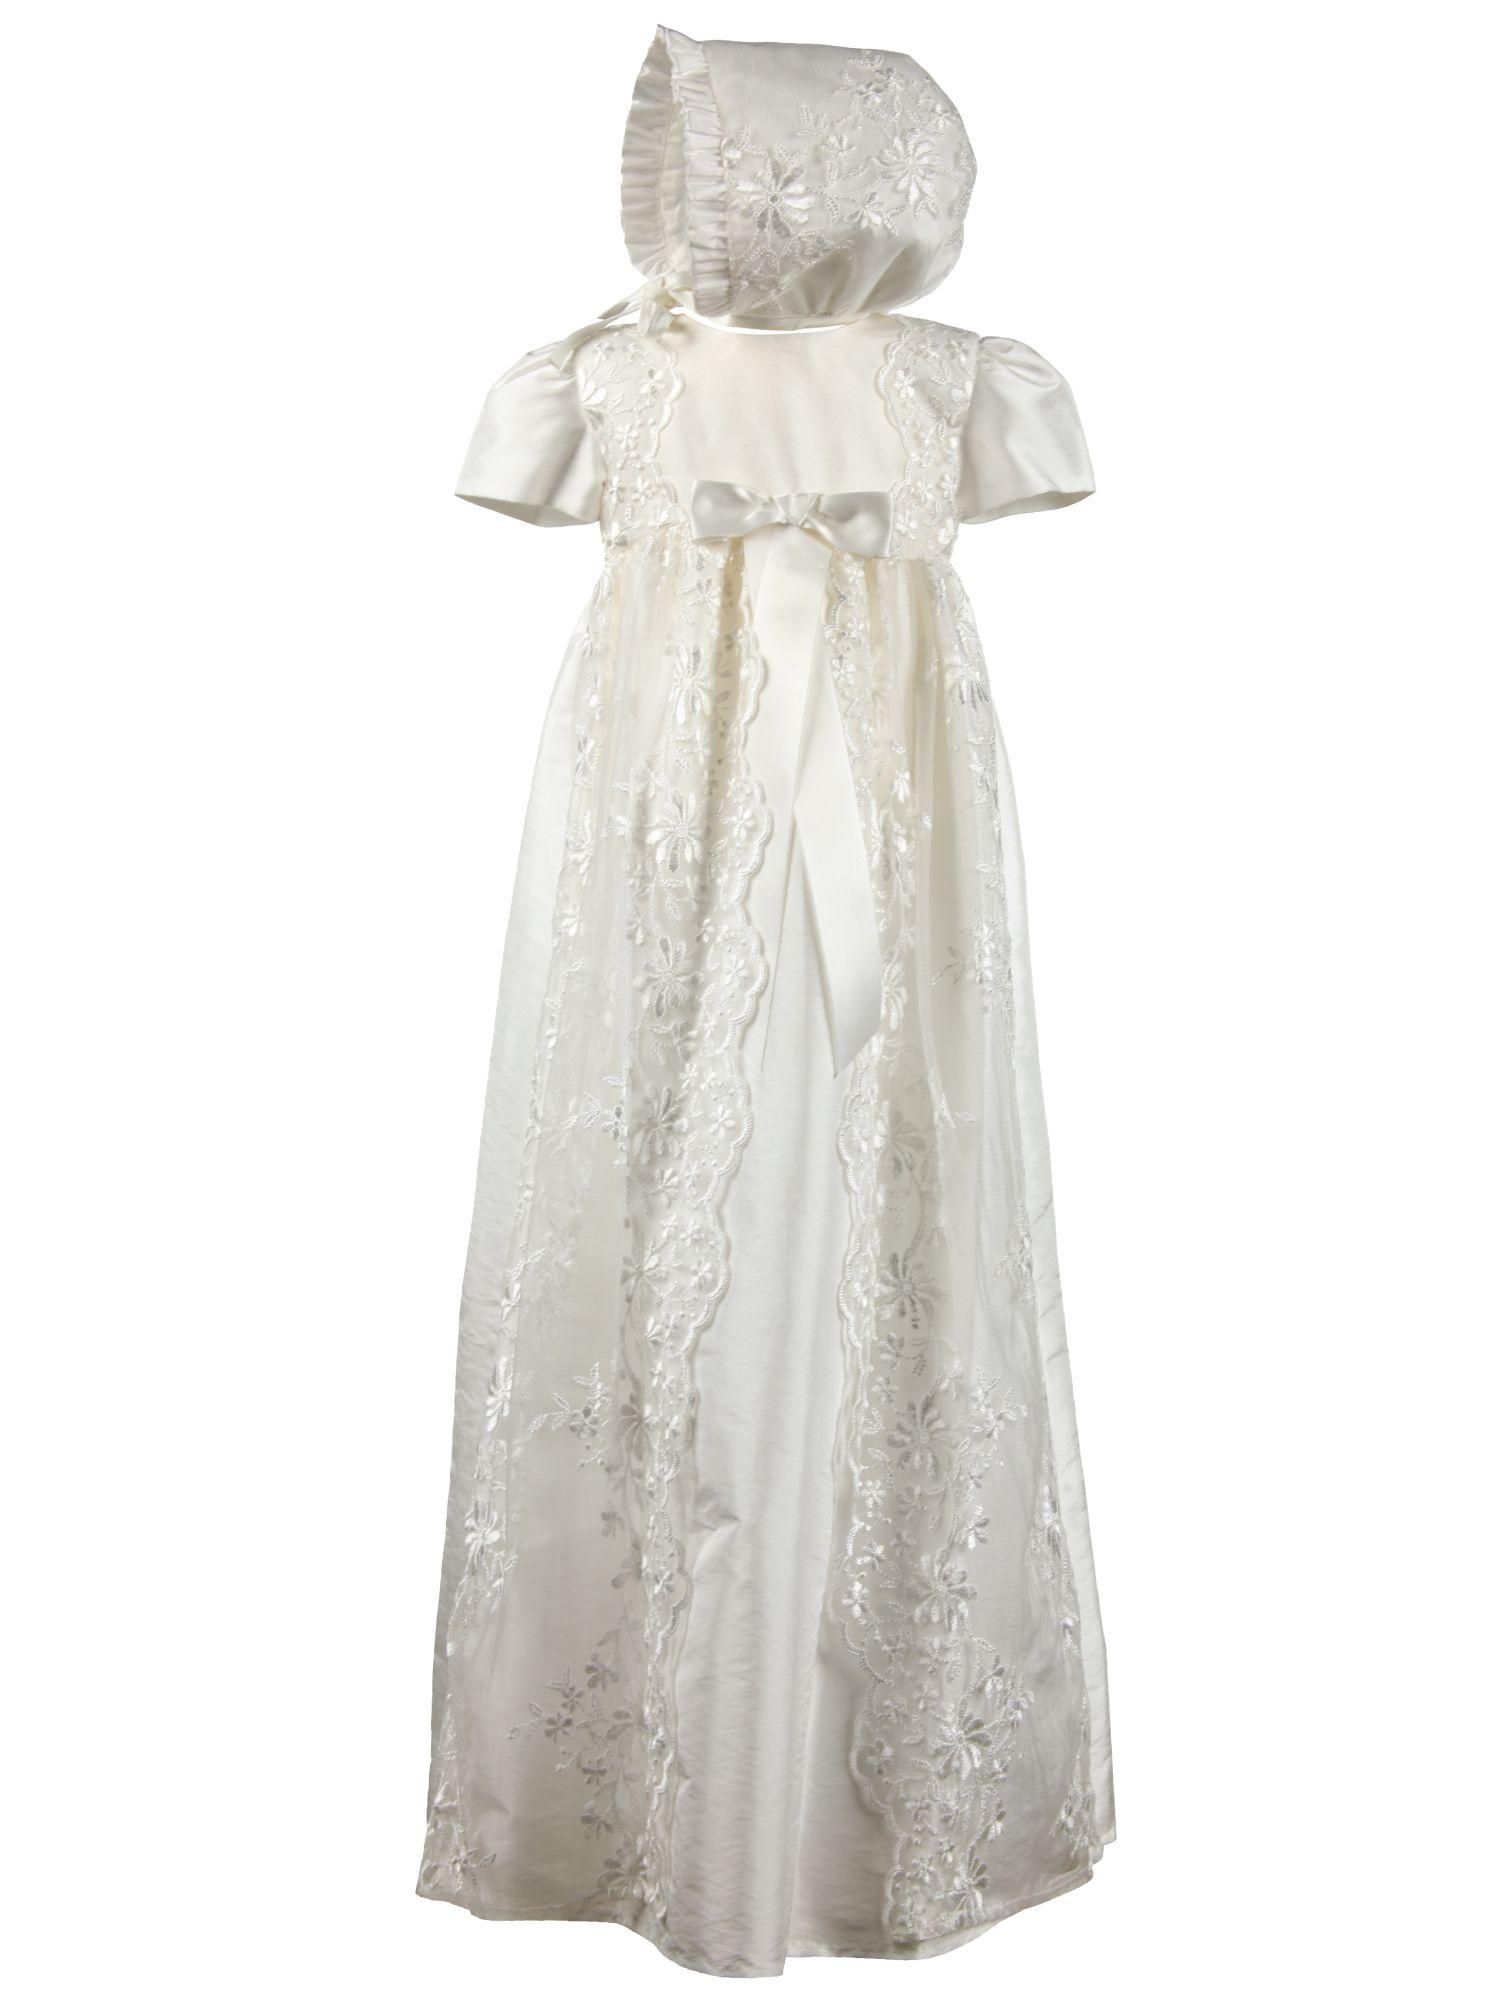 Baby Christening Robe